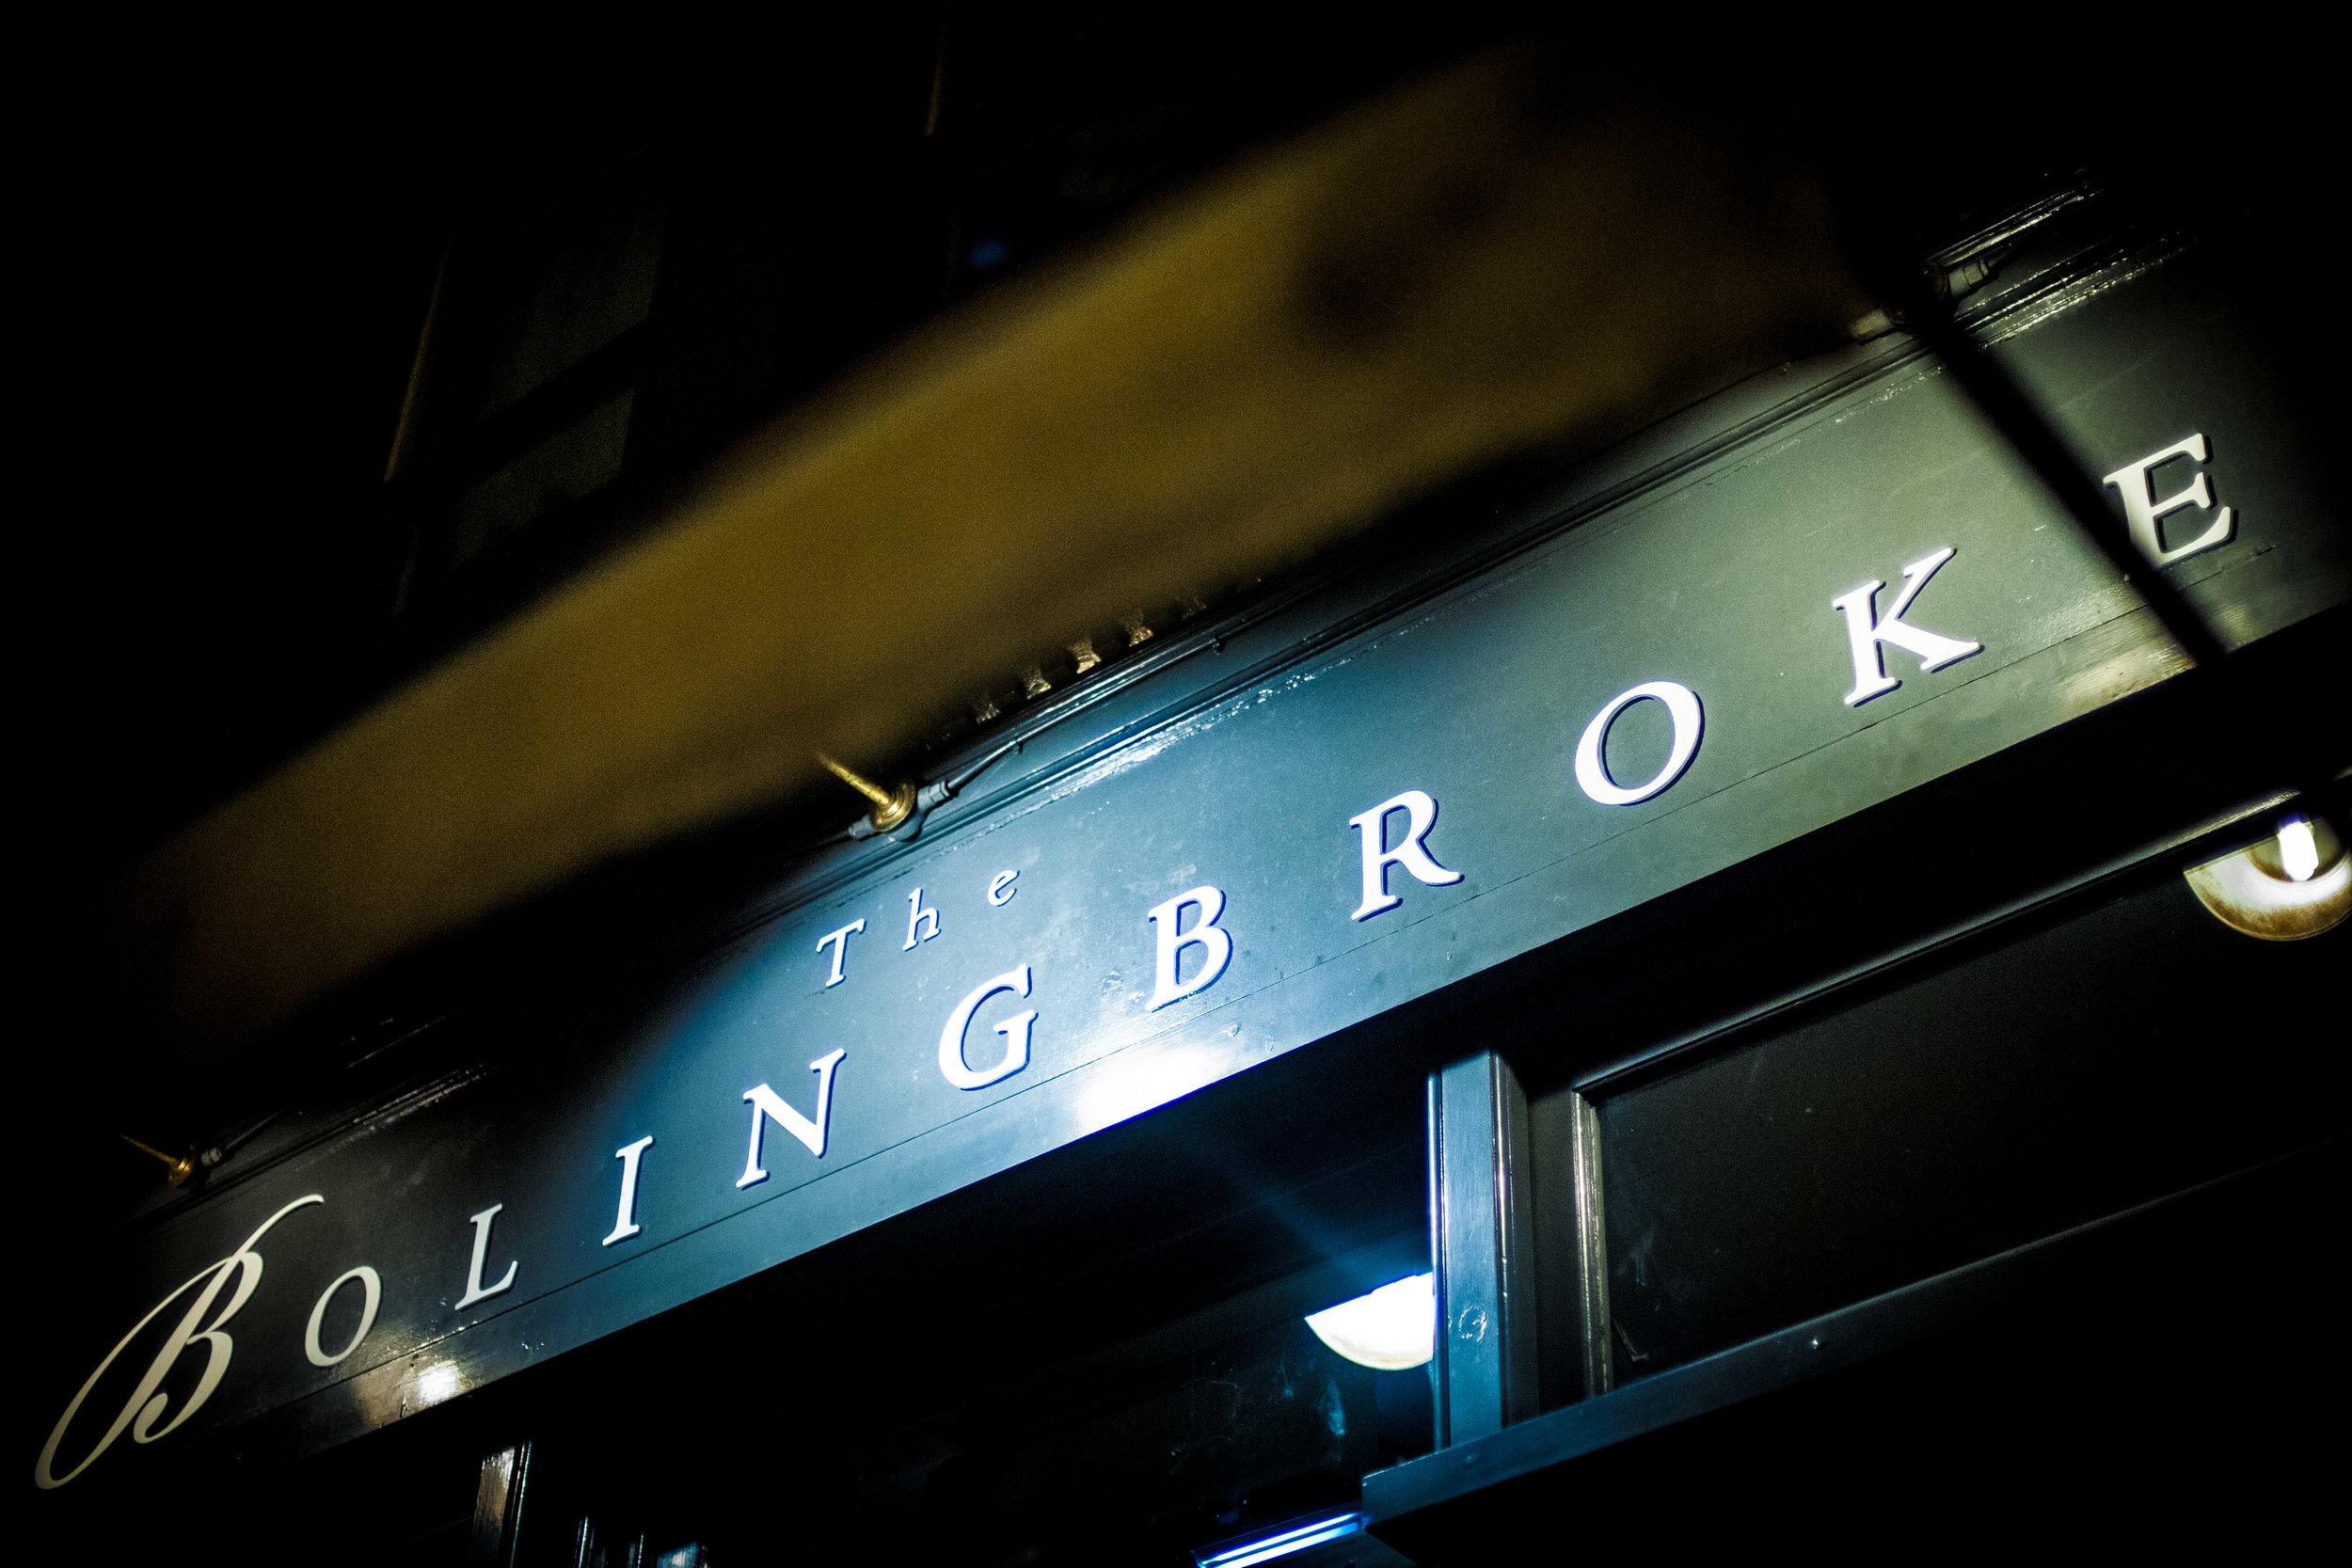 The-Bolingbroke-1.jpg